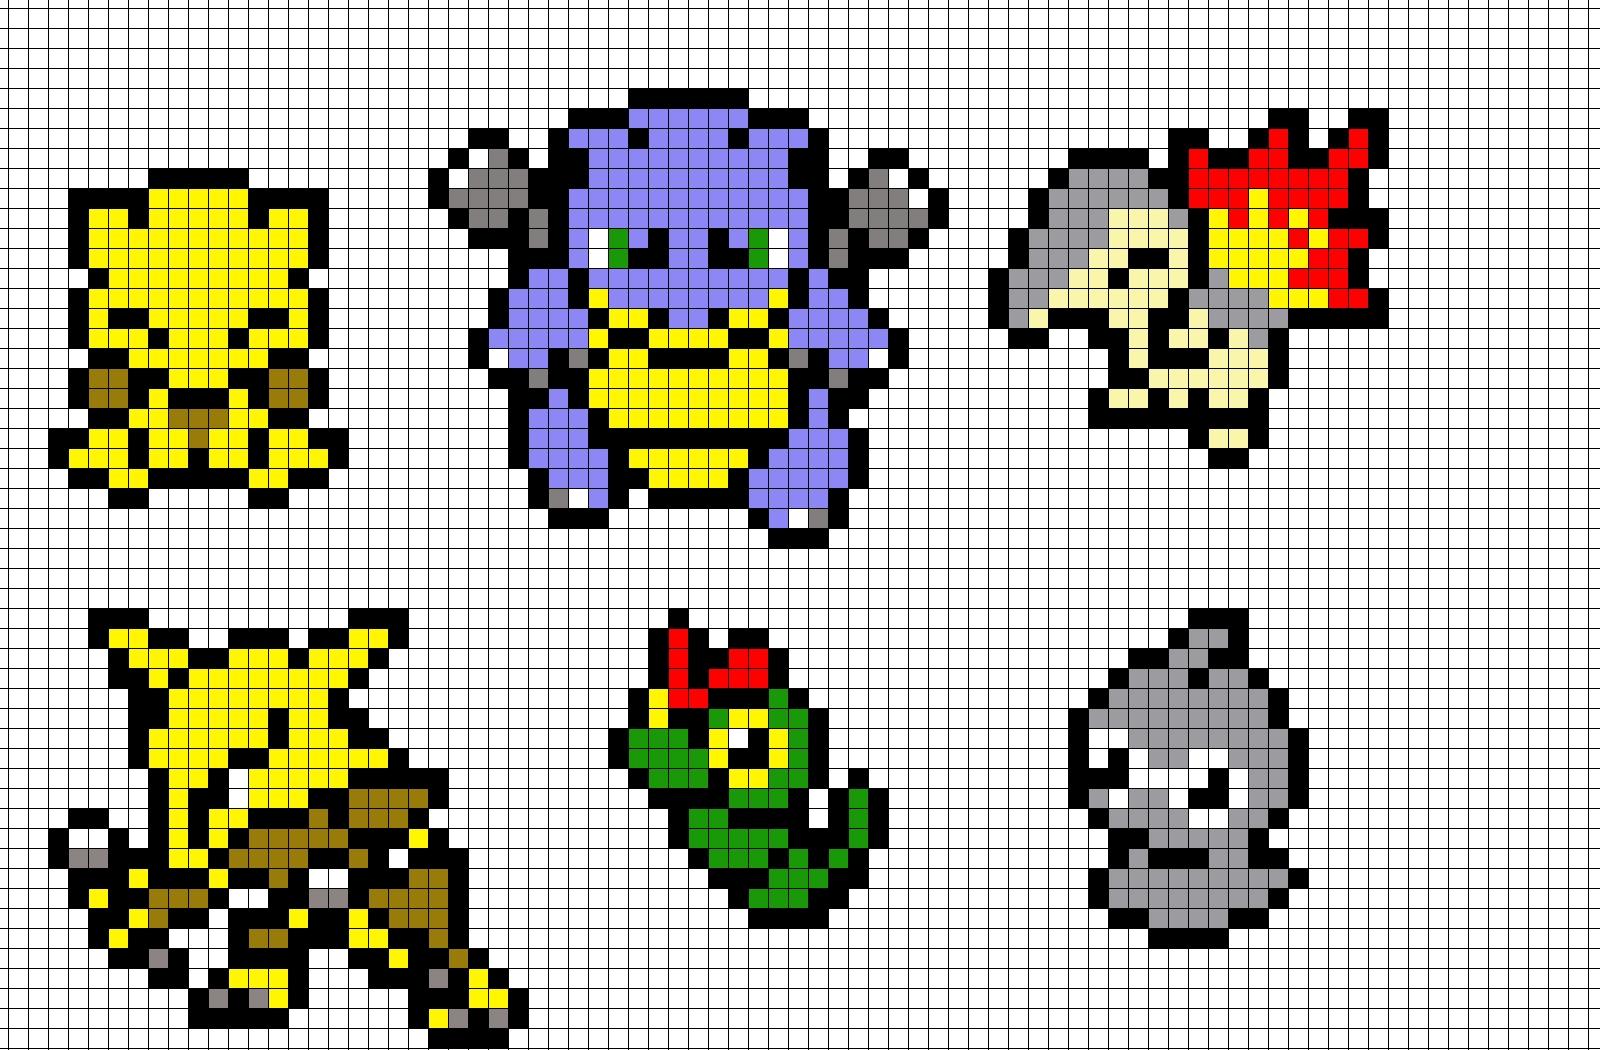 Pokemon Pixel Art By Brainless937 On Deviantart